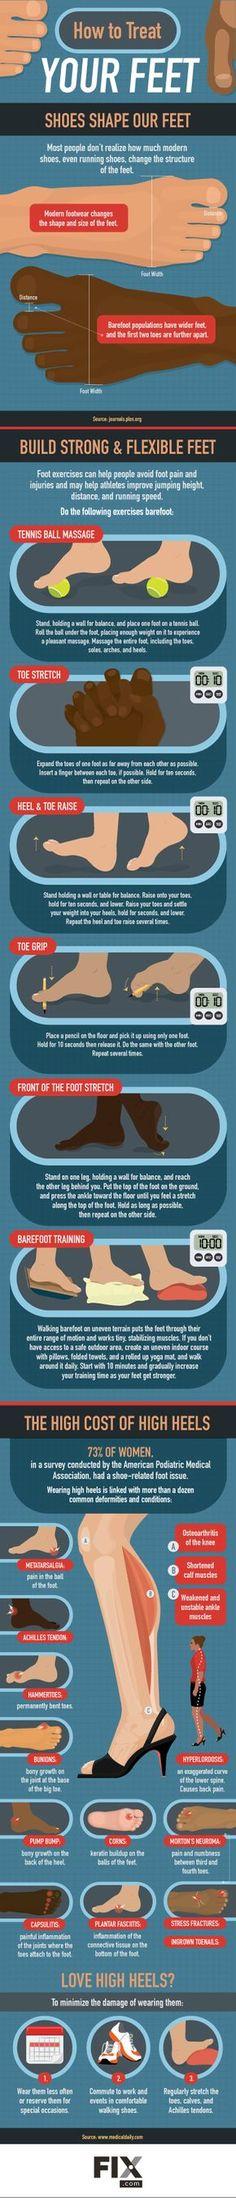 Avoid Foot Pain With Proper Footwear | Fix.com